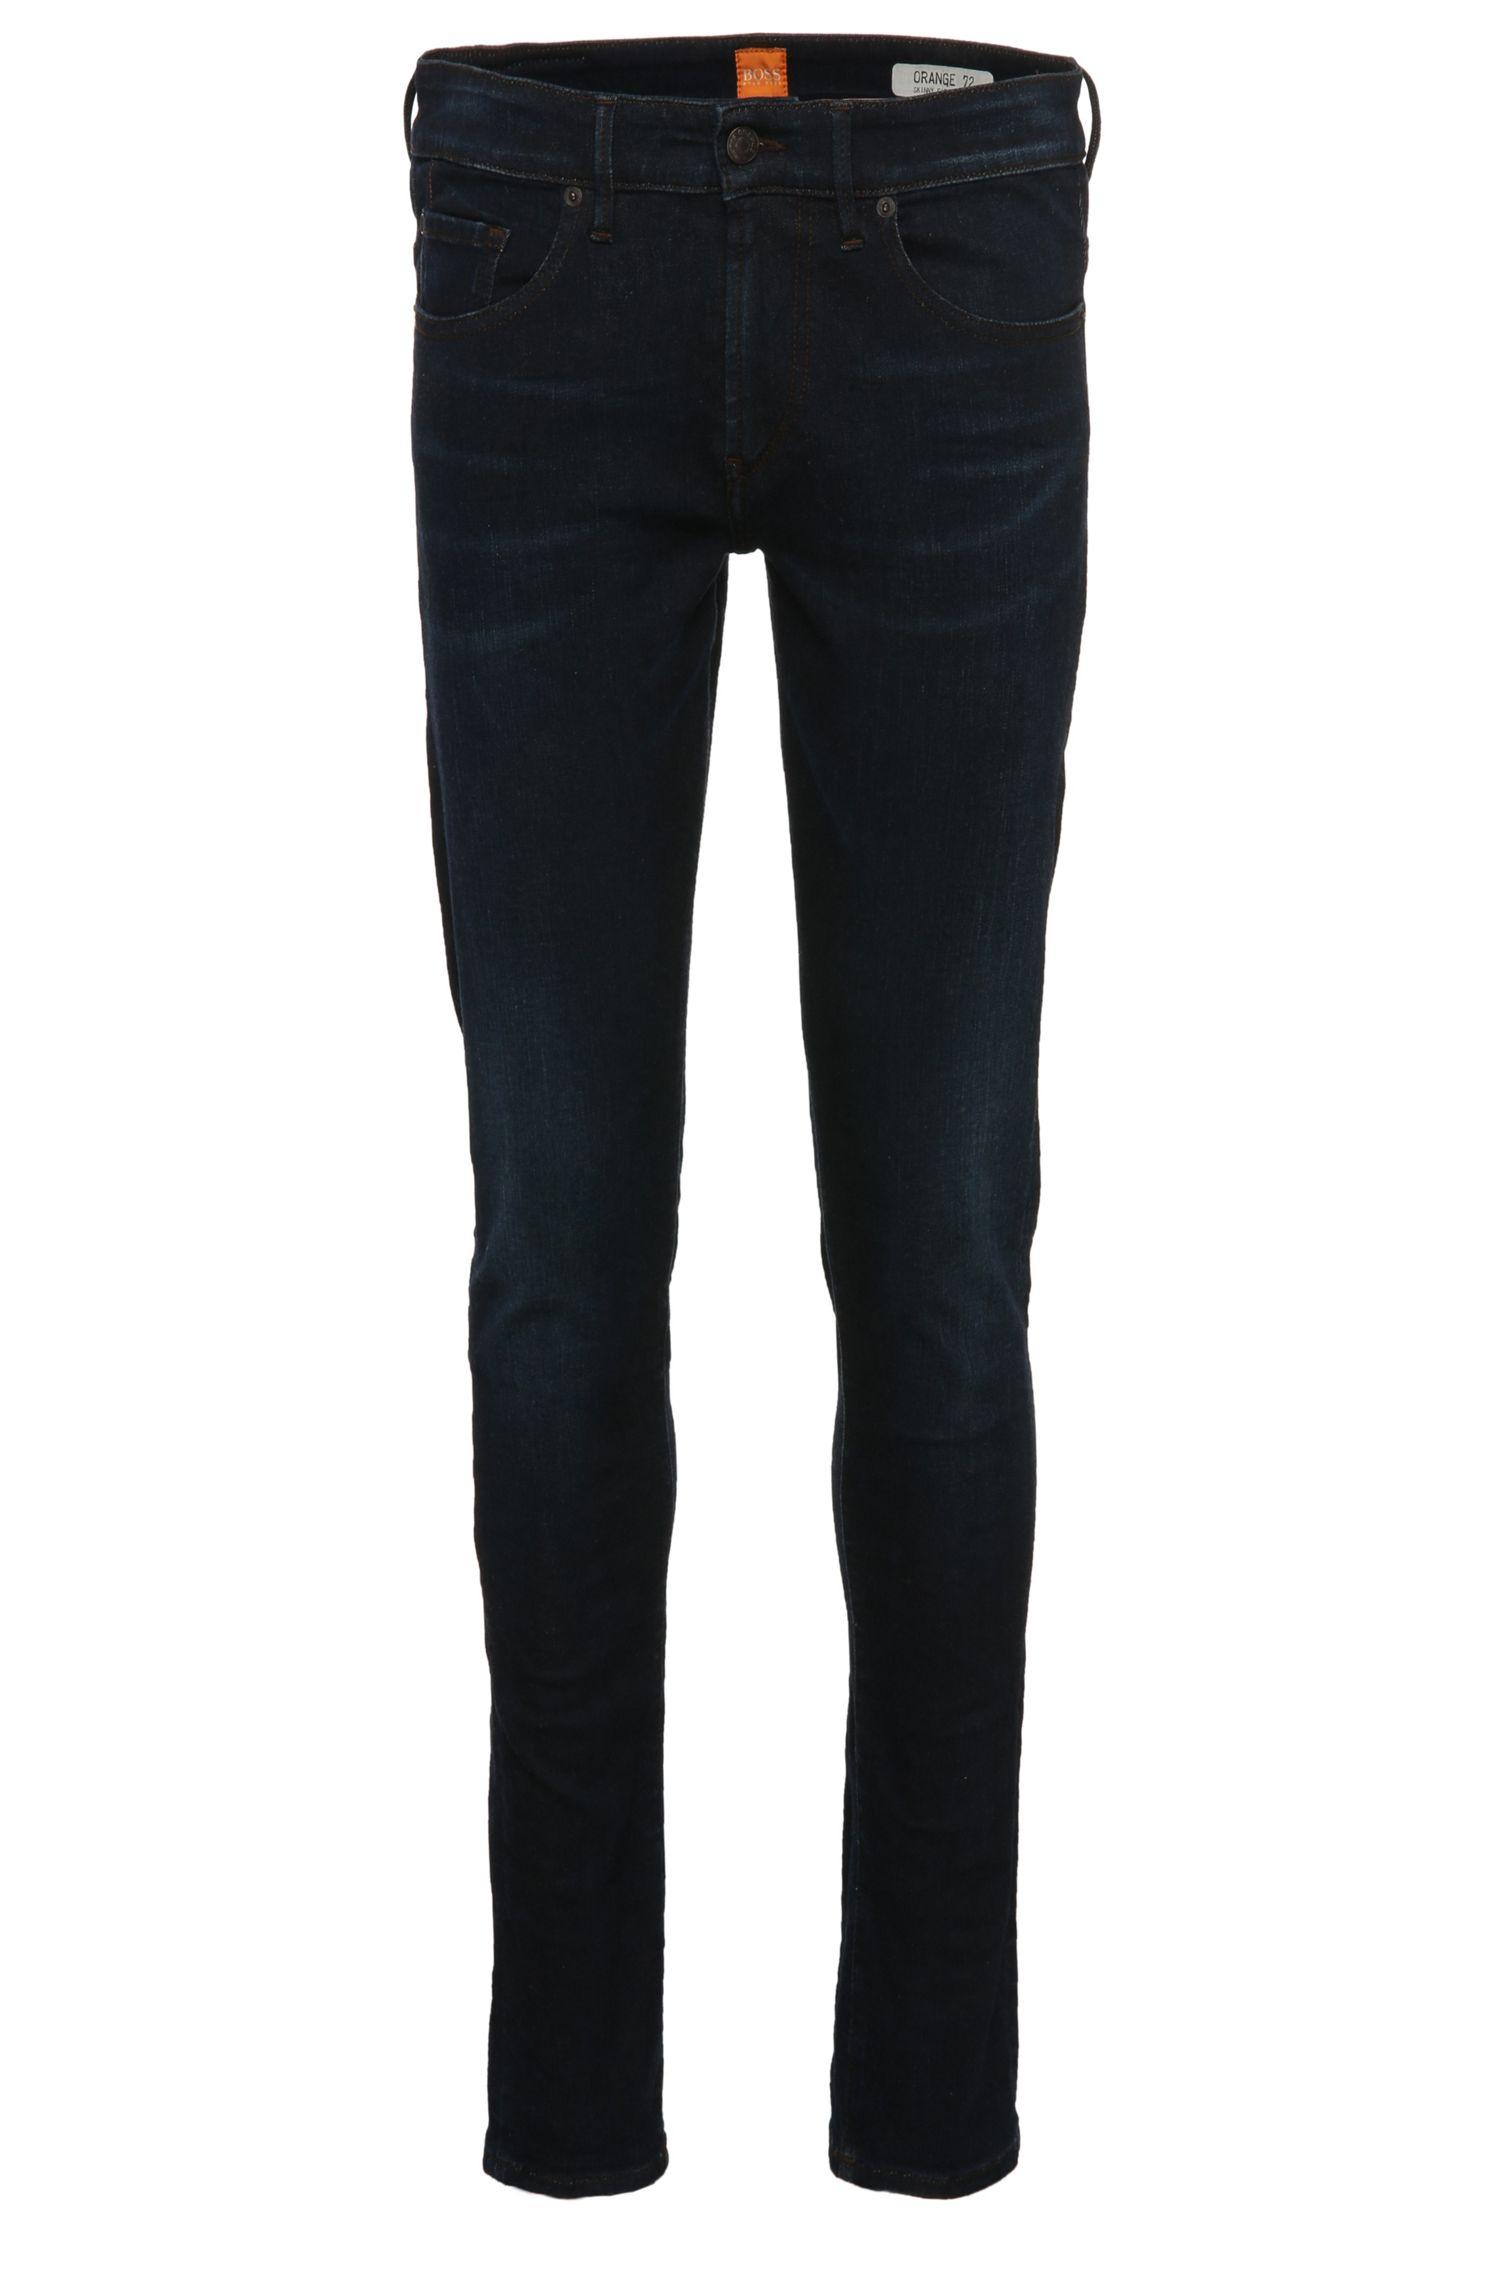 'Orange72' | Skinny Fit, 10.75 oz Stretch Cotton Blend Jeans